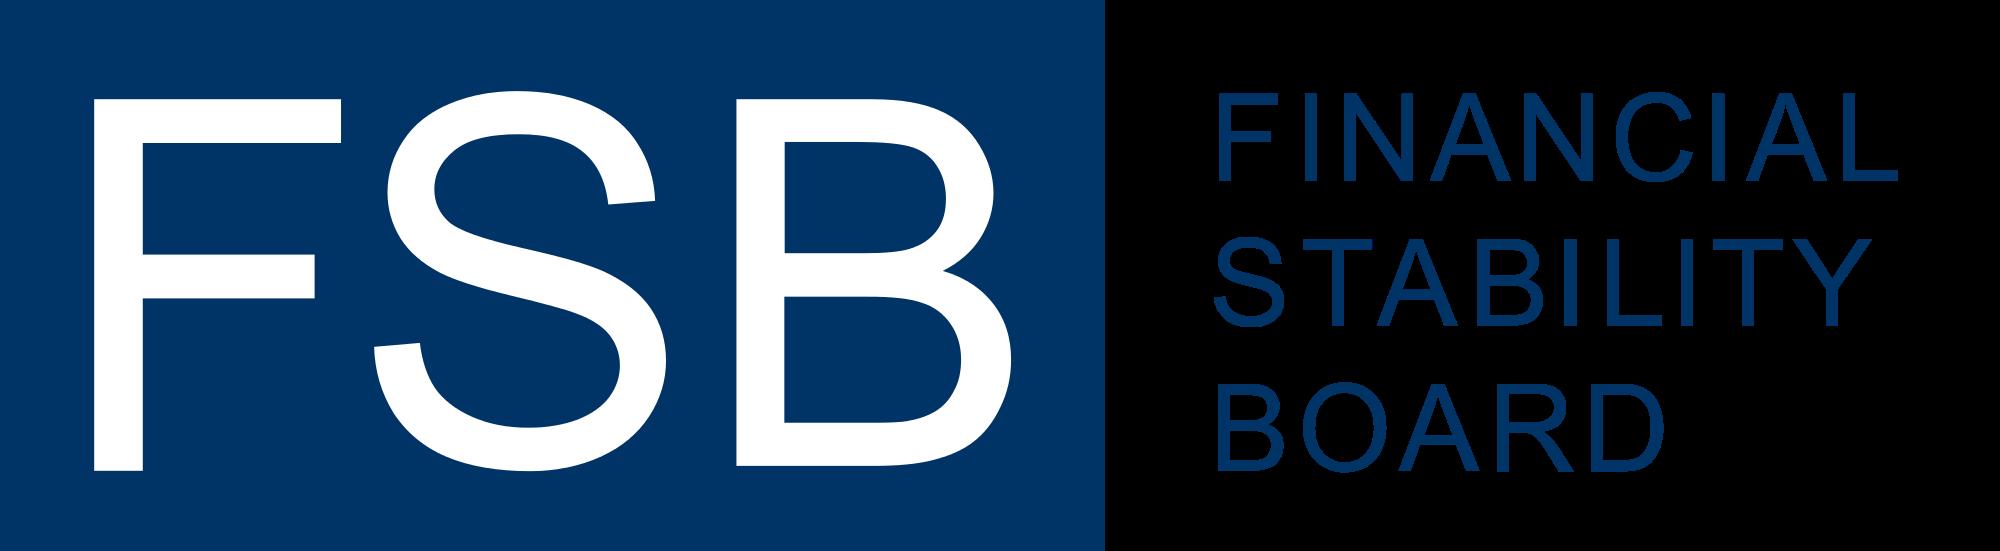 Financial Stability Board - FSB